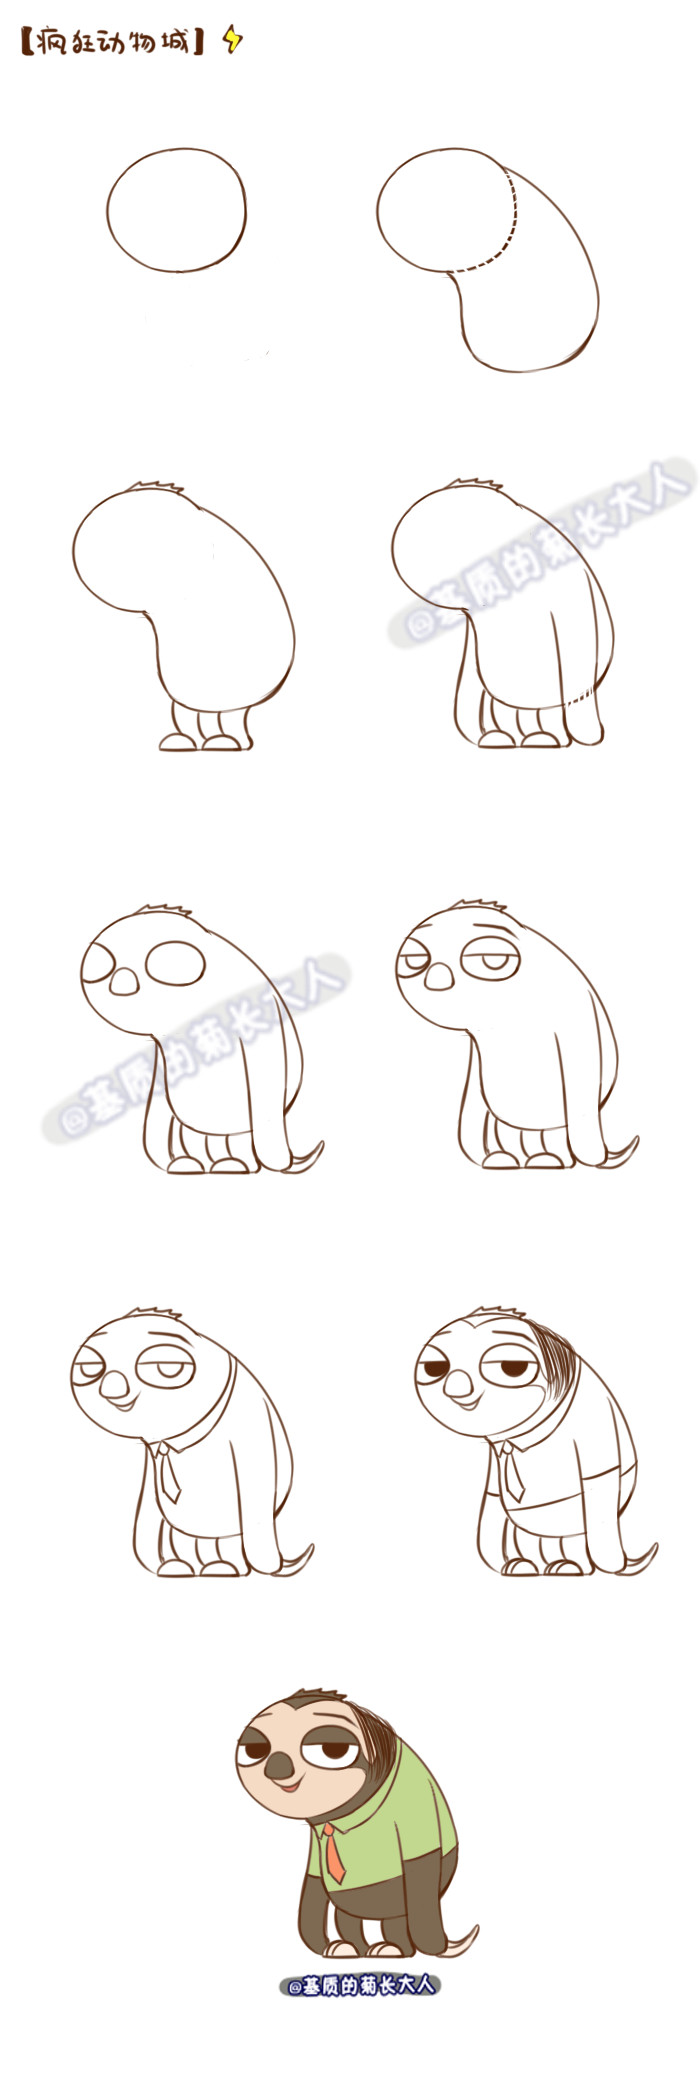 Draw a sloth, lightning!  Hekou Hekou port together!  Ju @ matrix grew from people